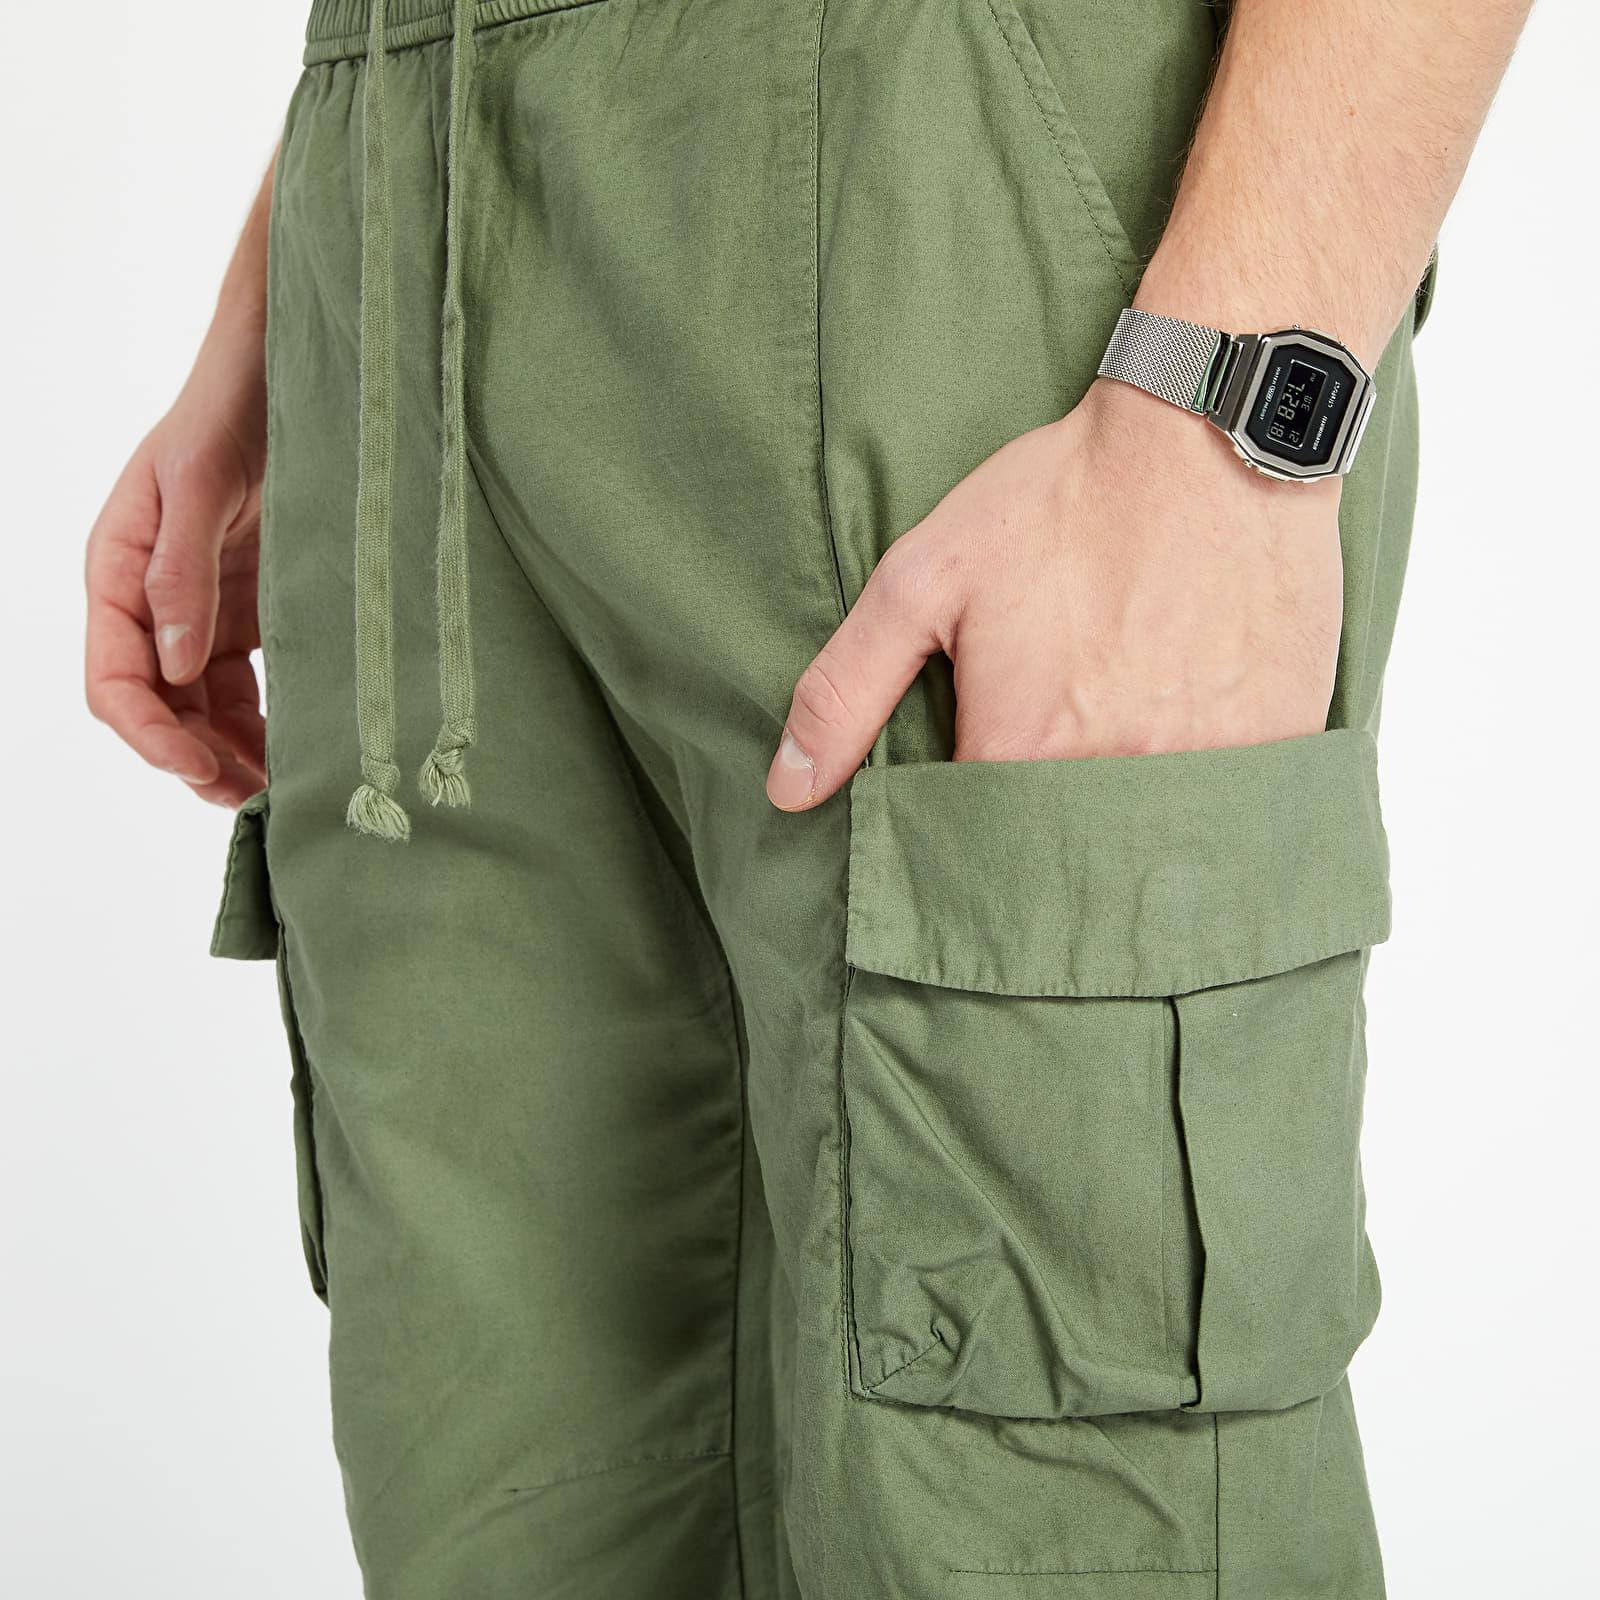 Pants and jeans John Elliott Back Sateen Cargo Pants Olive